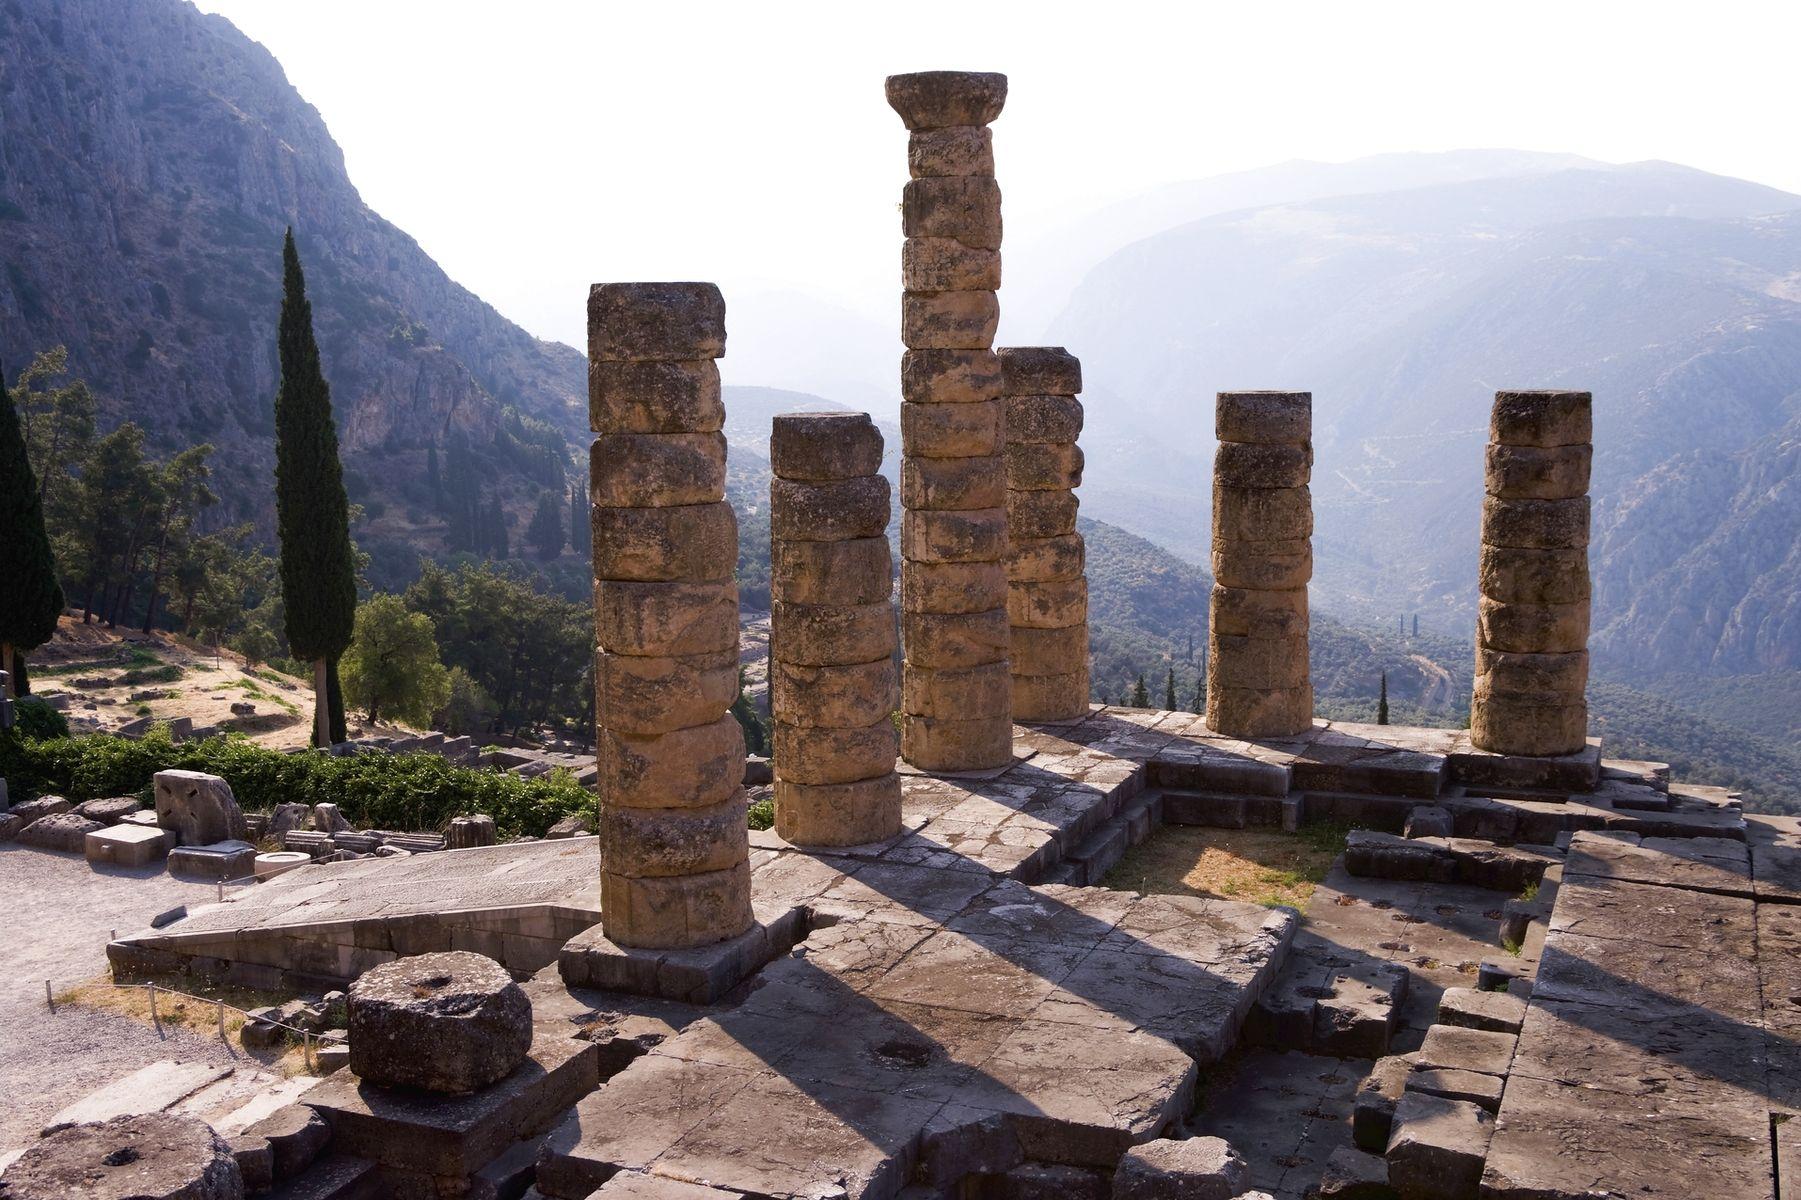 Unesco: Τα 18 ελληνικά μνημεία που πρέπει οπωσδήποτε να δει κανείς στη ζωή του (ΦΩΤΟ)